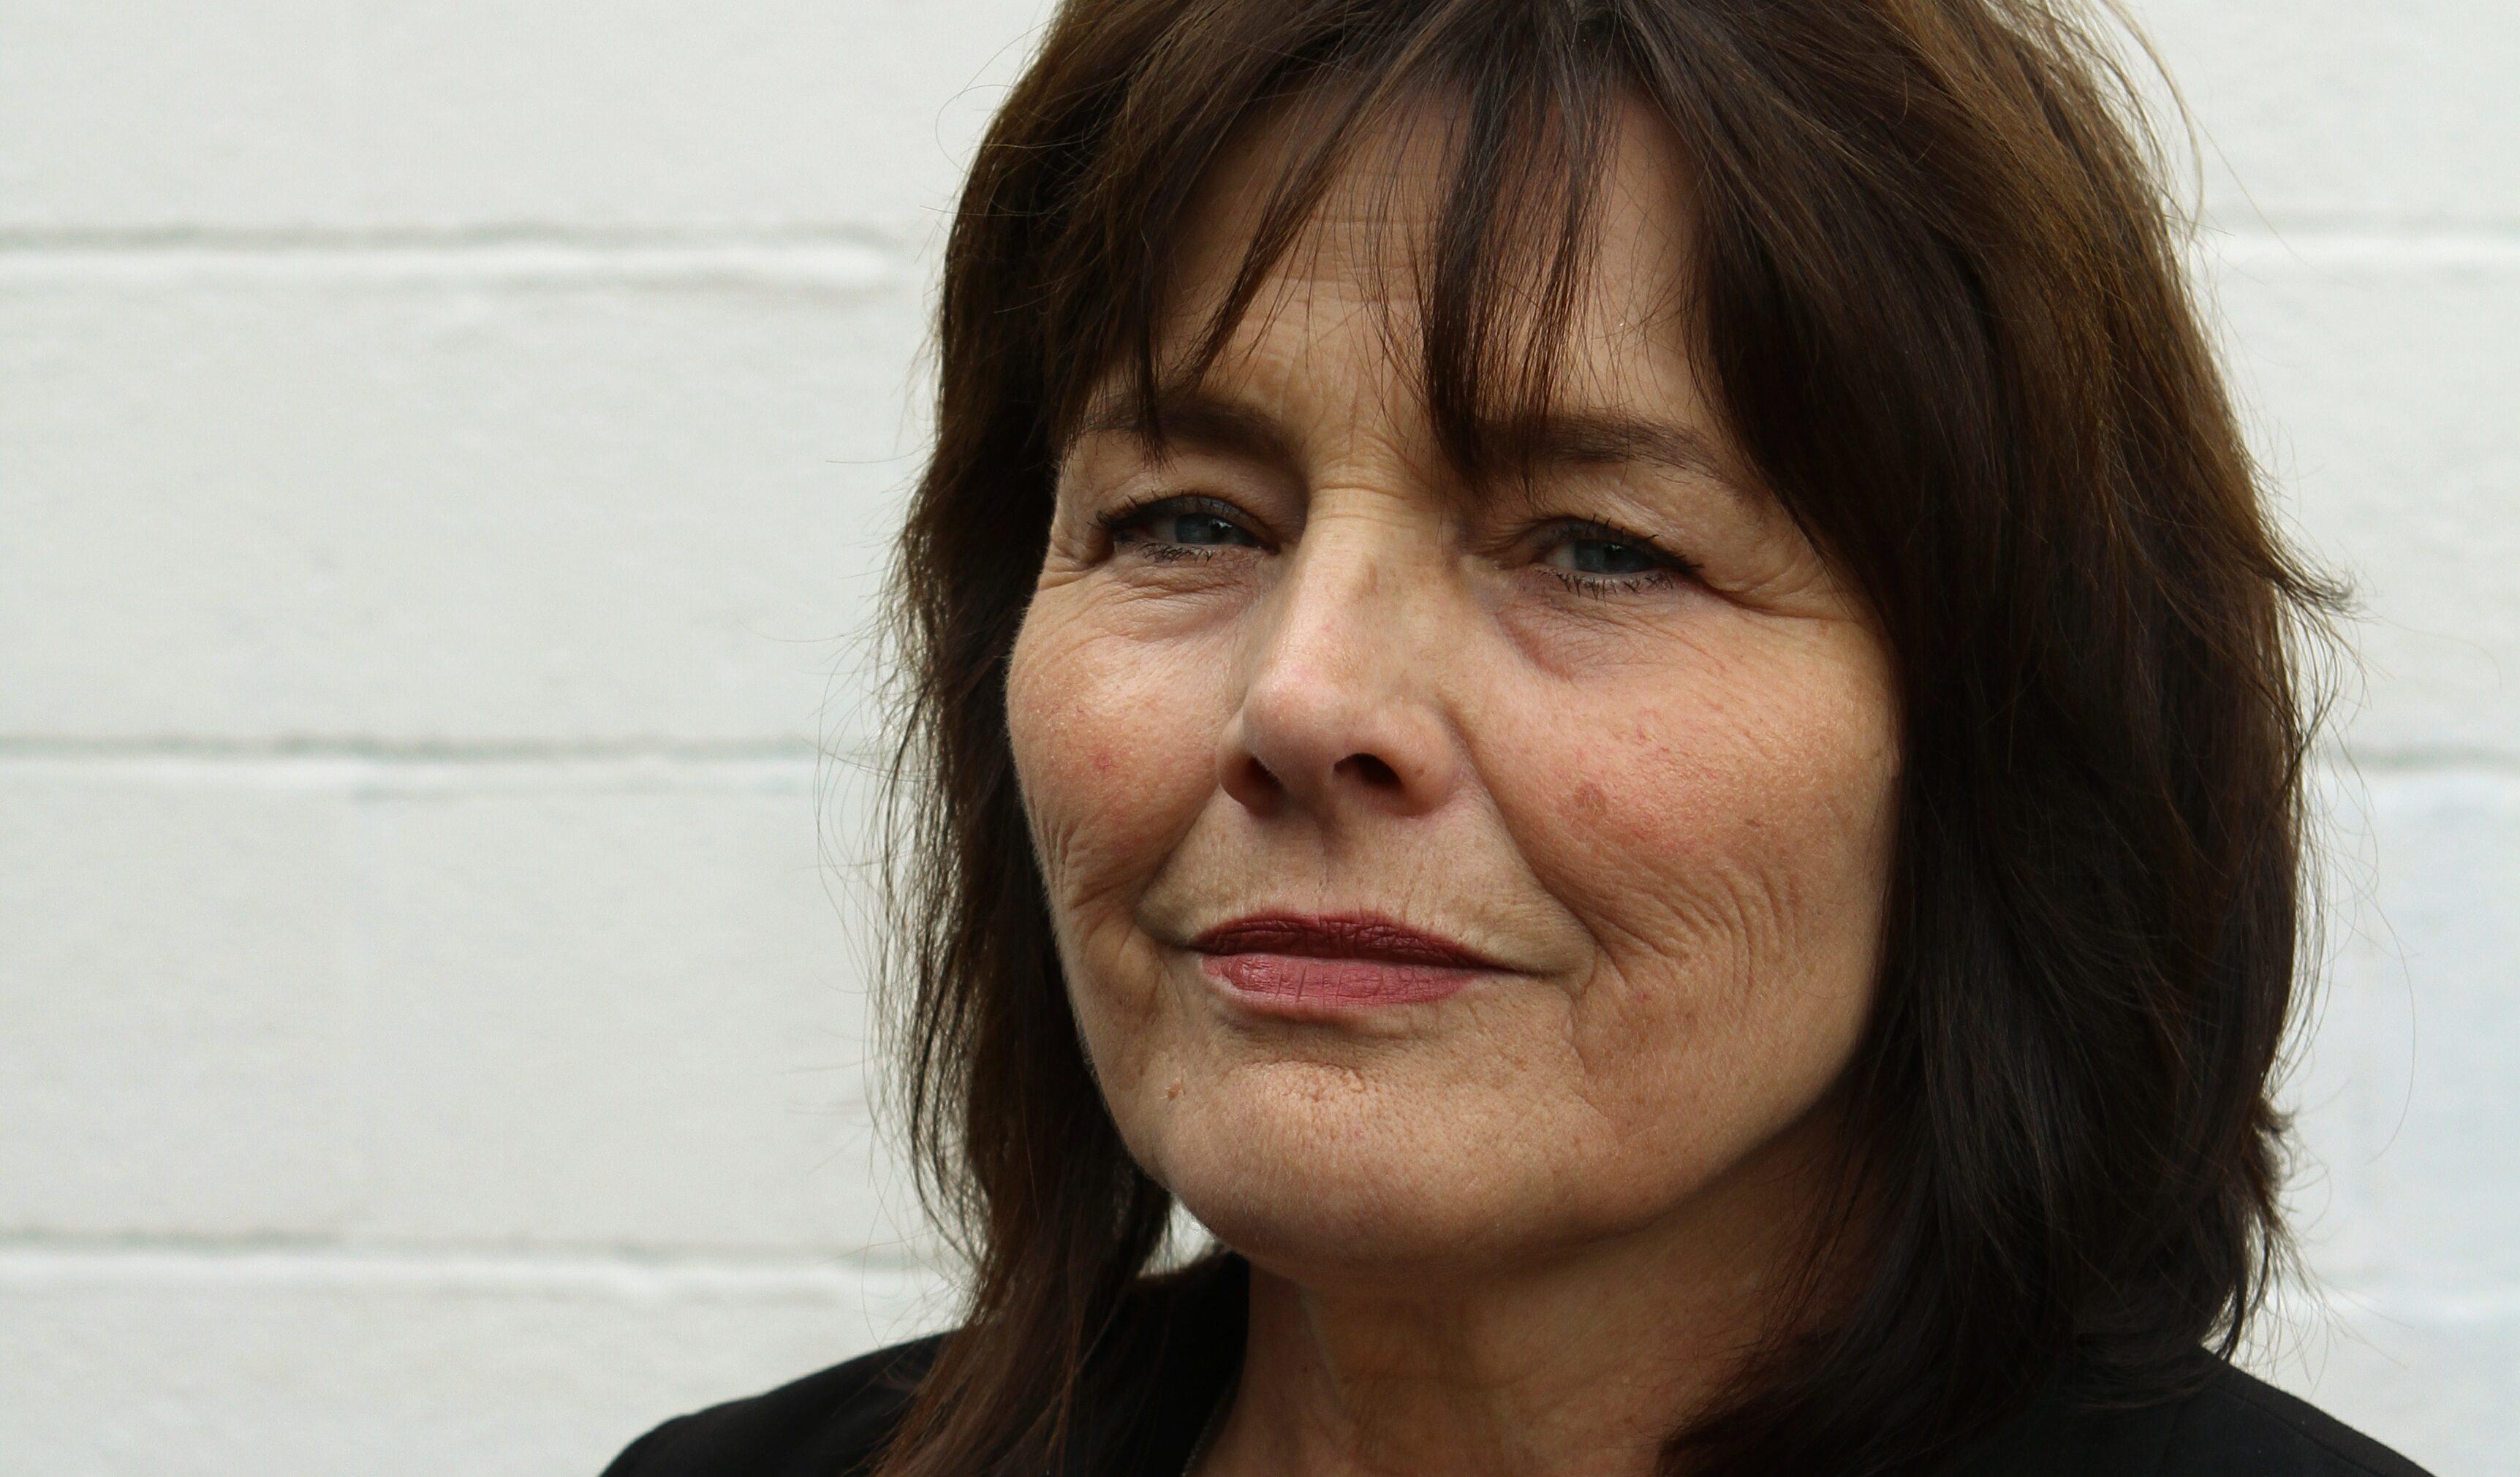 Jeane Freeman. (Dougie Nicholson / DC Thomson)